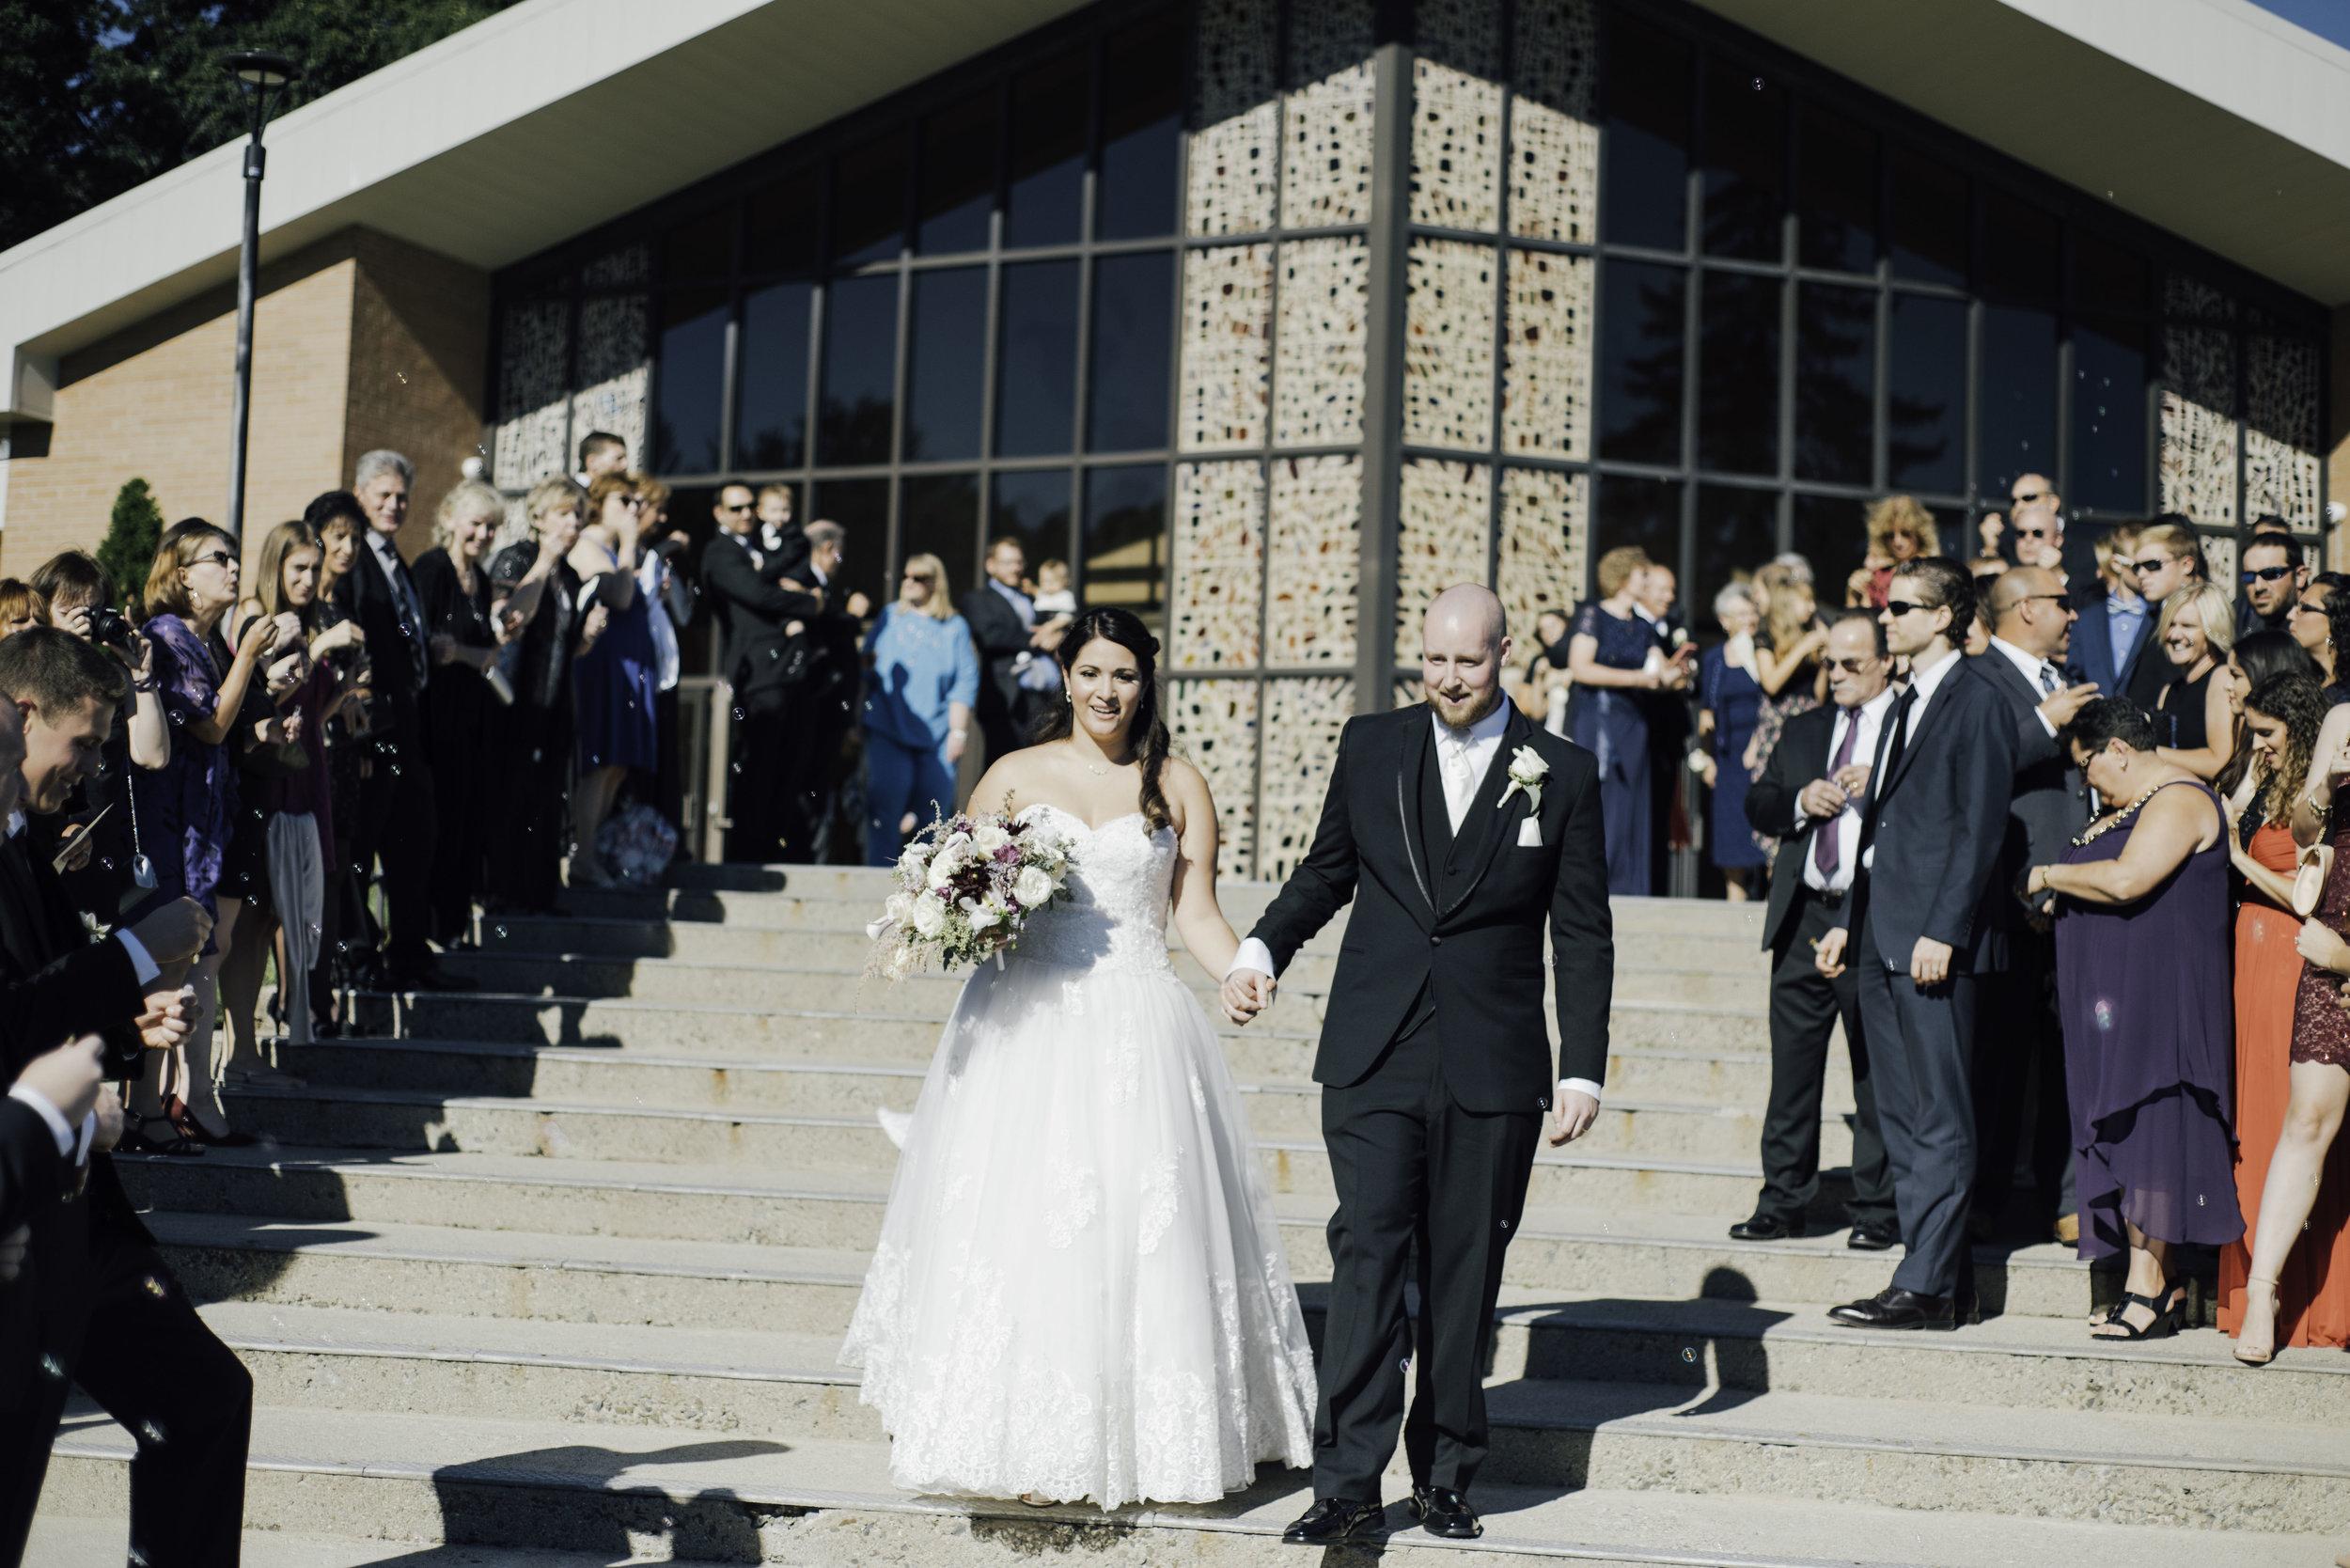 Weddingphotos-268.jpg